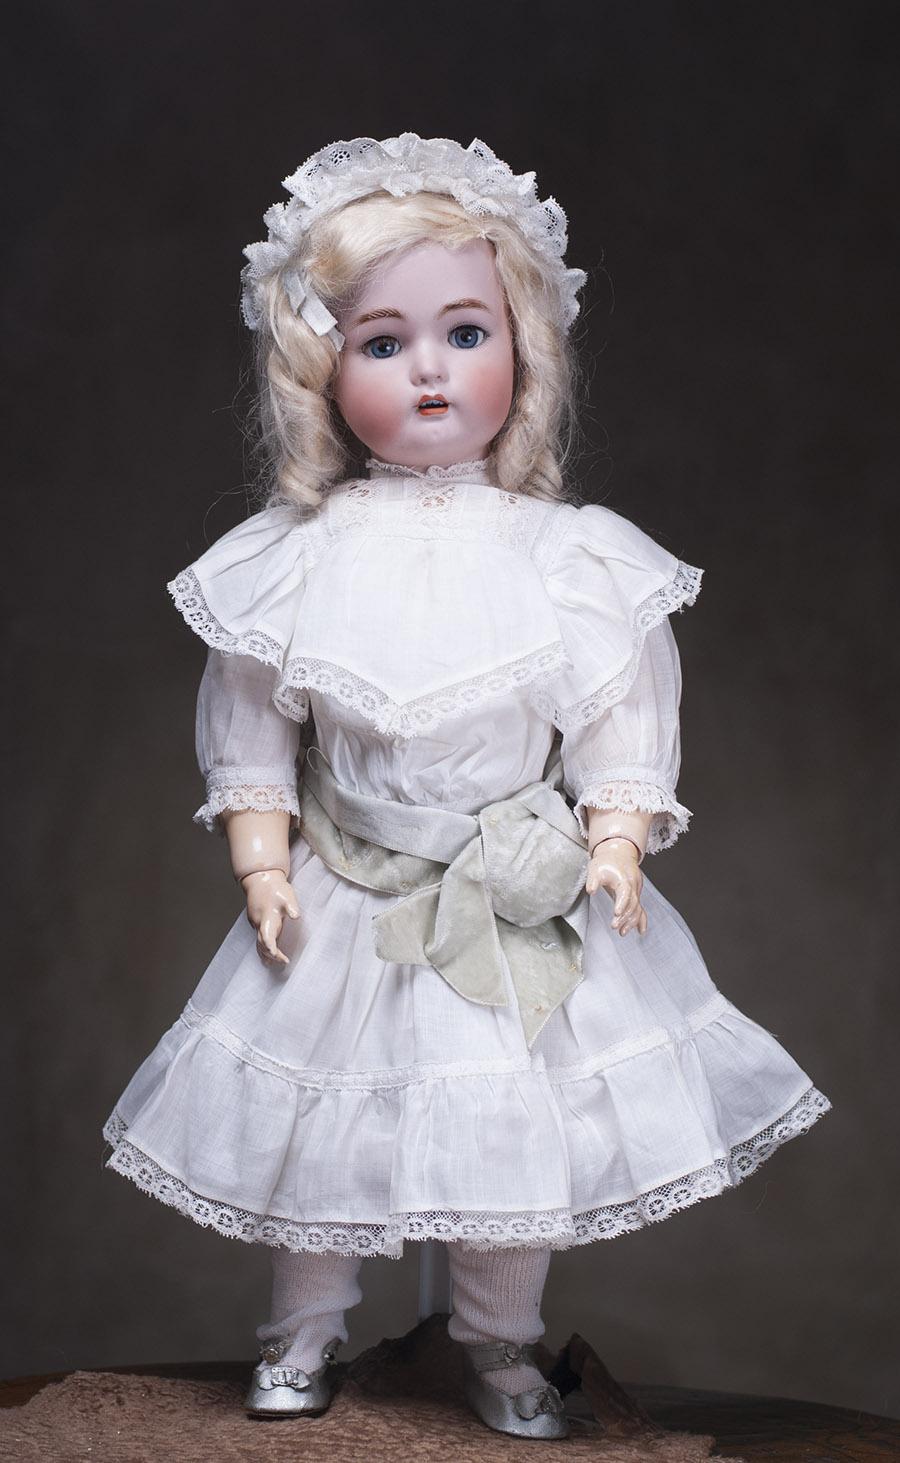 Кукла  Simon&Halbig, Kammer&Reinhardt 50 см высотой, 1900-е годы